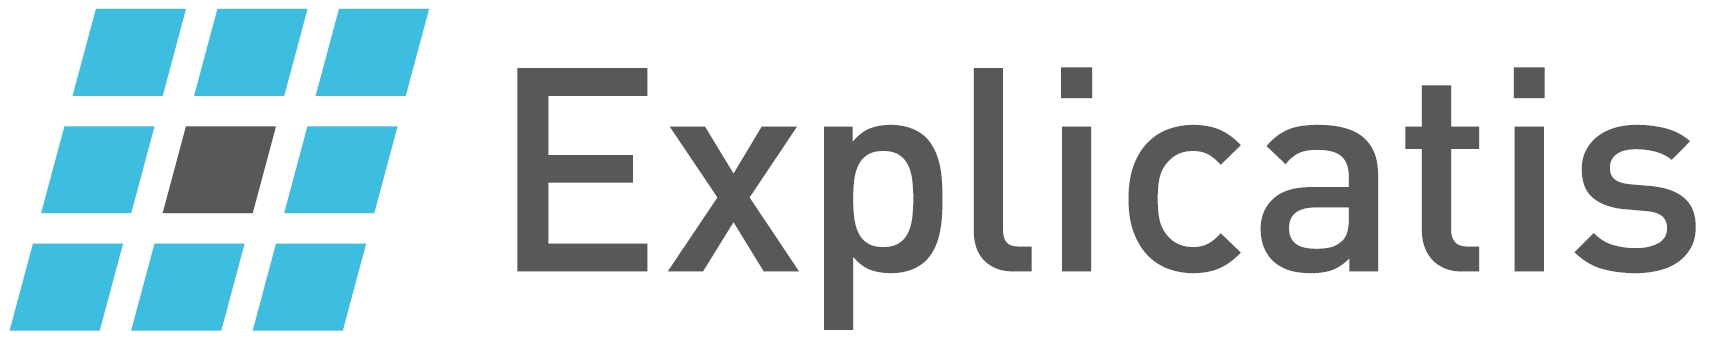 Explicatis erhält erneut den Fast 50 Award von Deloitte